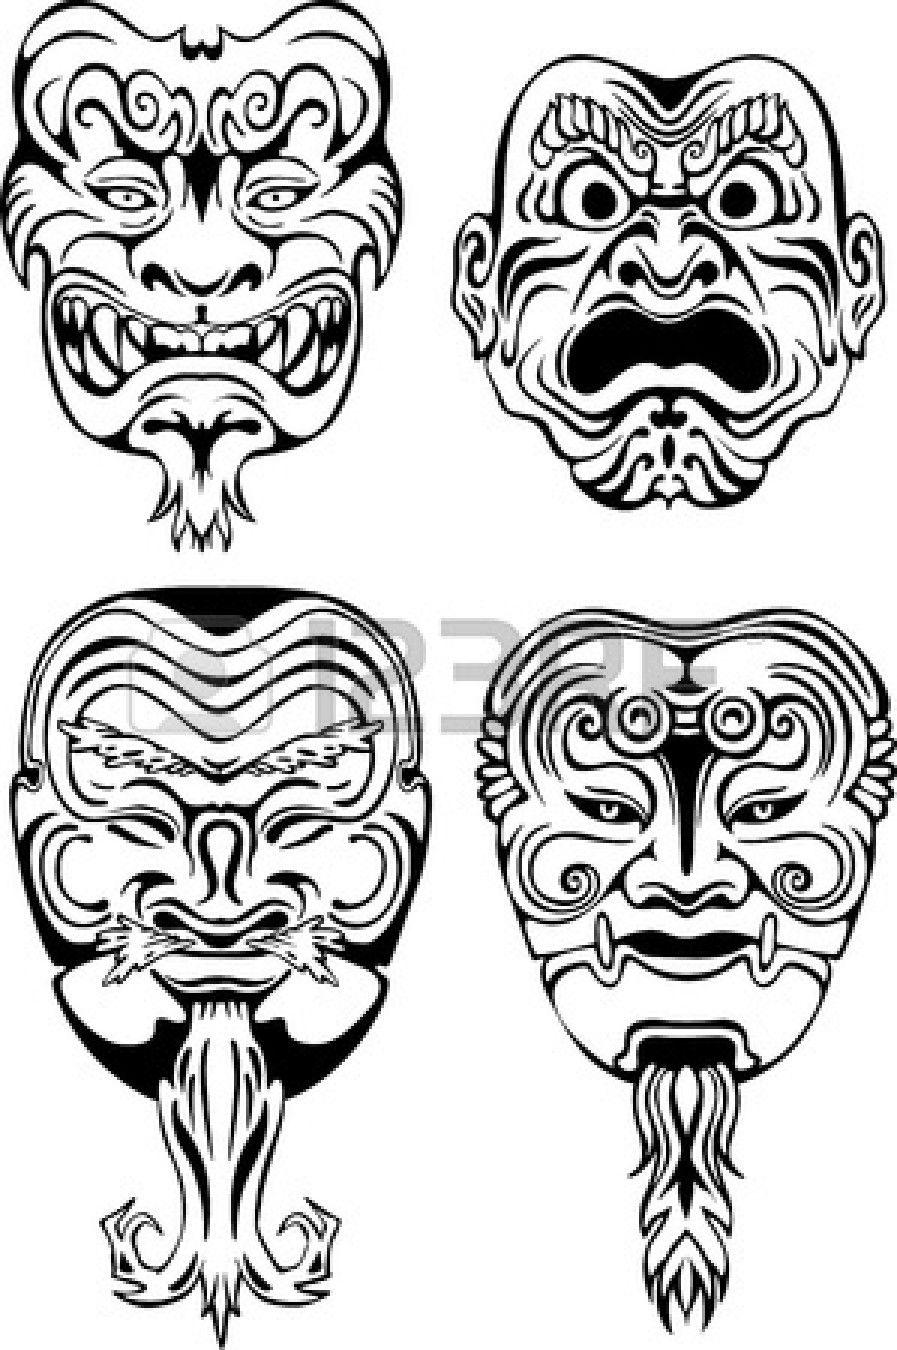 japanese tsure noh theatrical masks set of black and. Black Bedroom Furniture Sets. Home Design Ideas